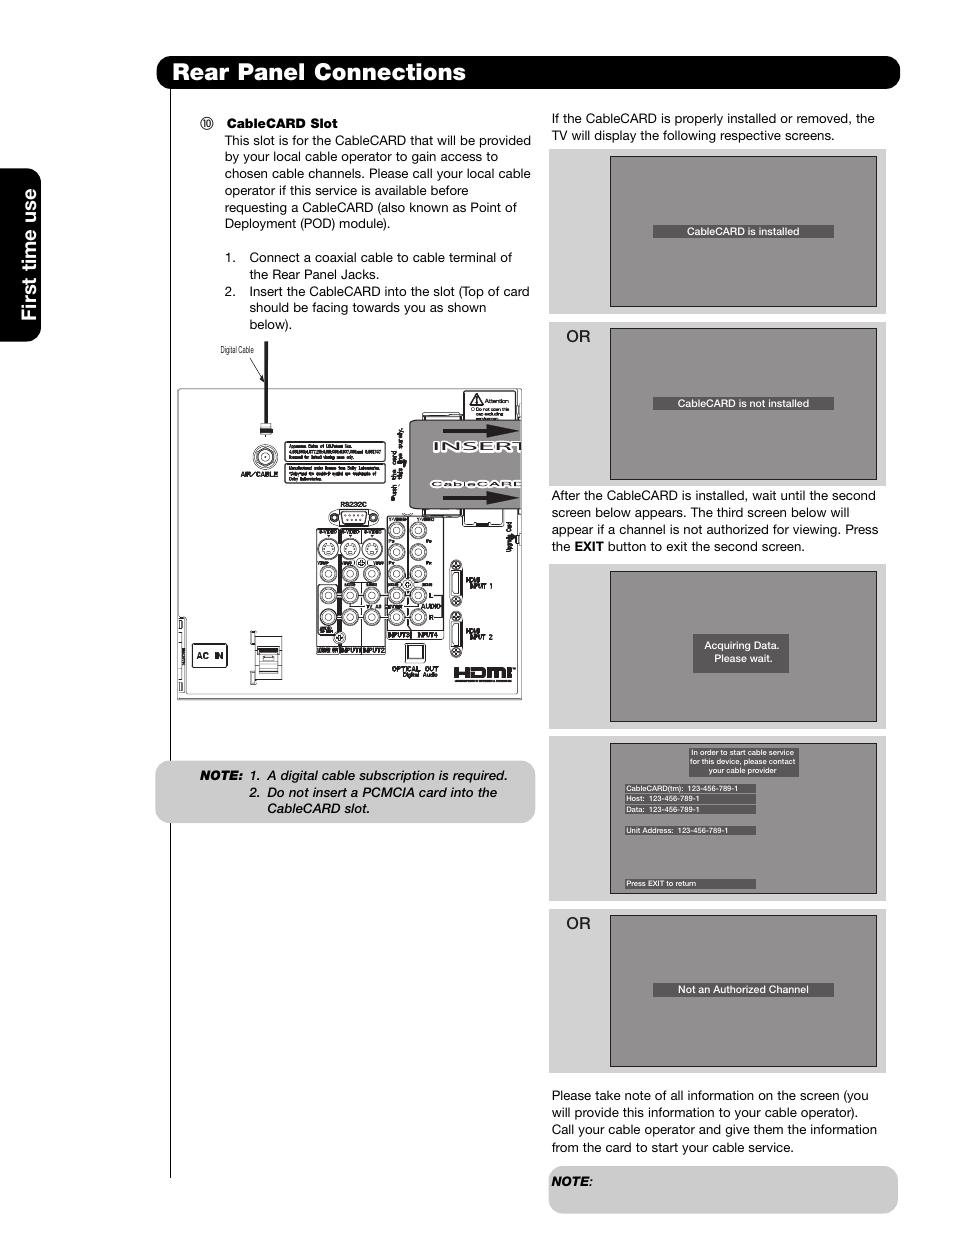 rear panel connections first time use hitachi 55hds69 user manual rh manualsdir com 2006 Hitachi Flat Screen T V Hitachi Tools